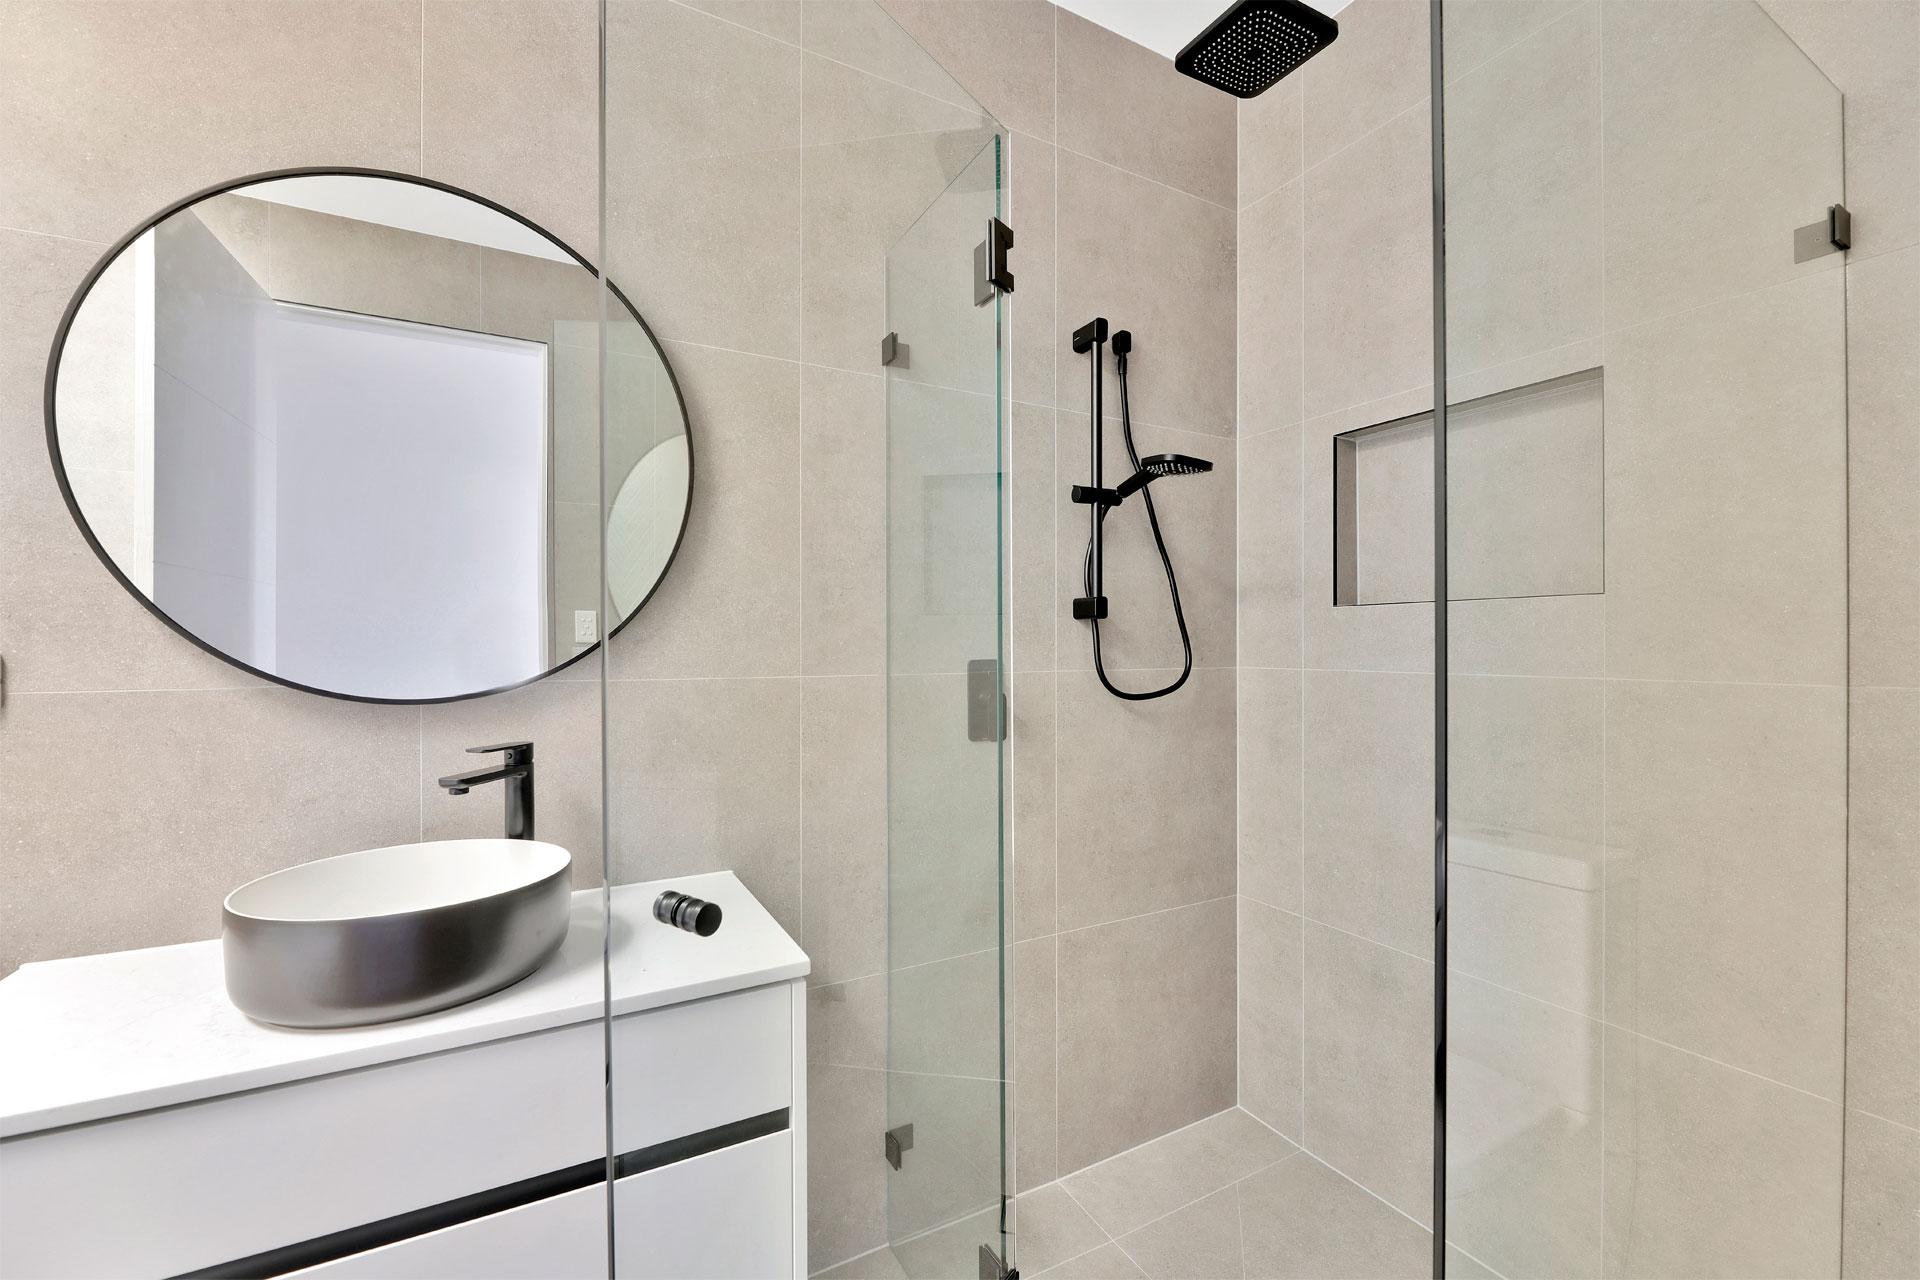 https://starwardrobes.com.au/wp-content/uploads/2021/07/About-Bathroom.jpg